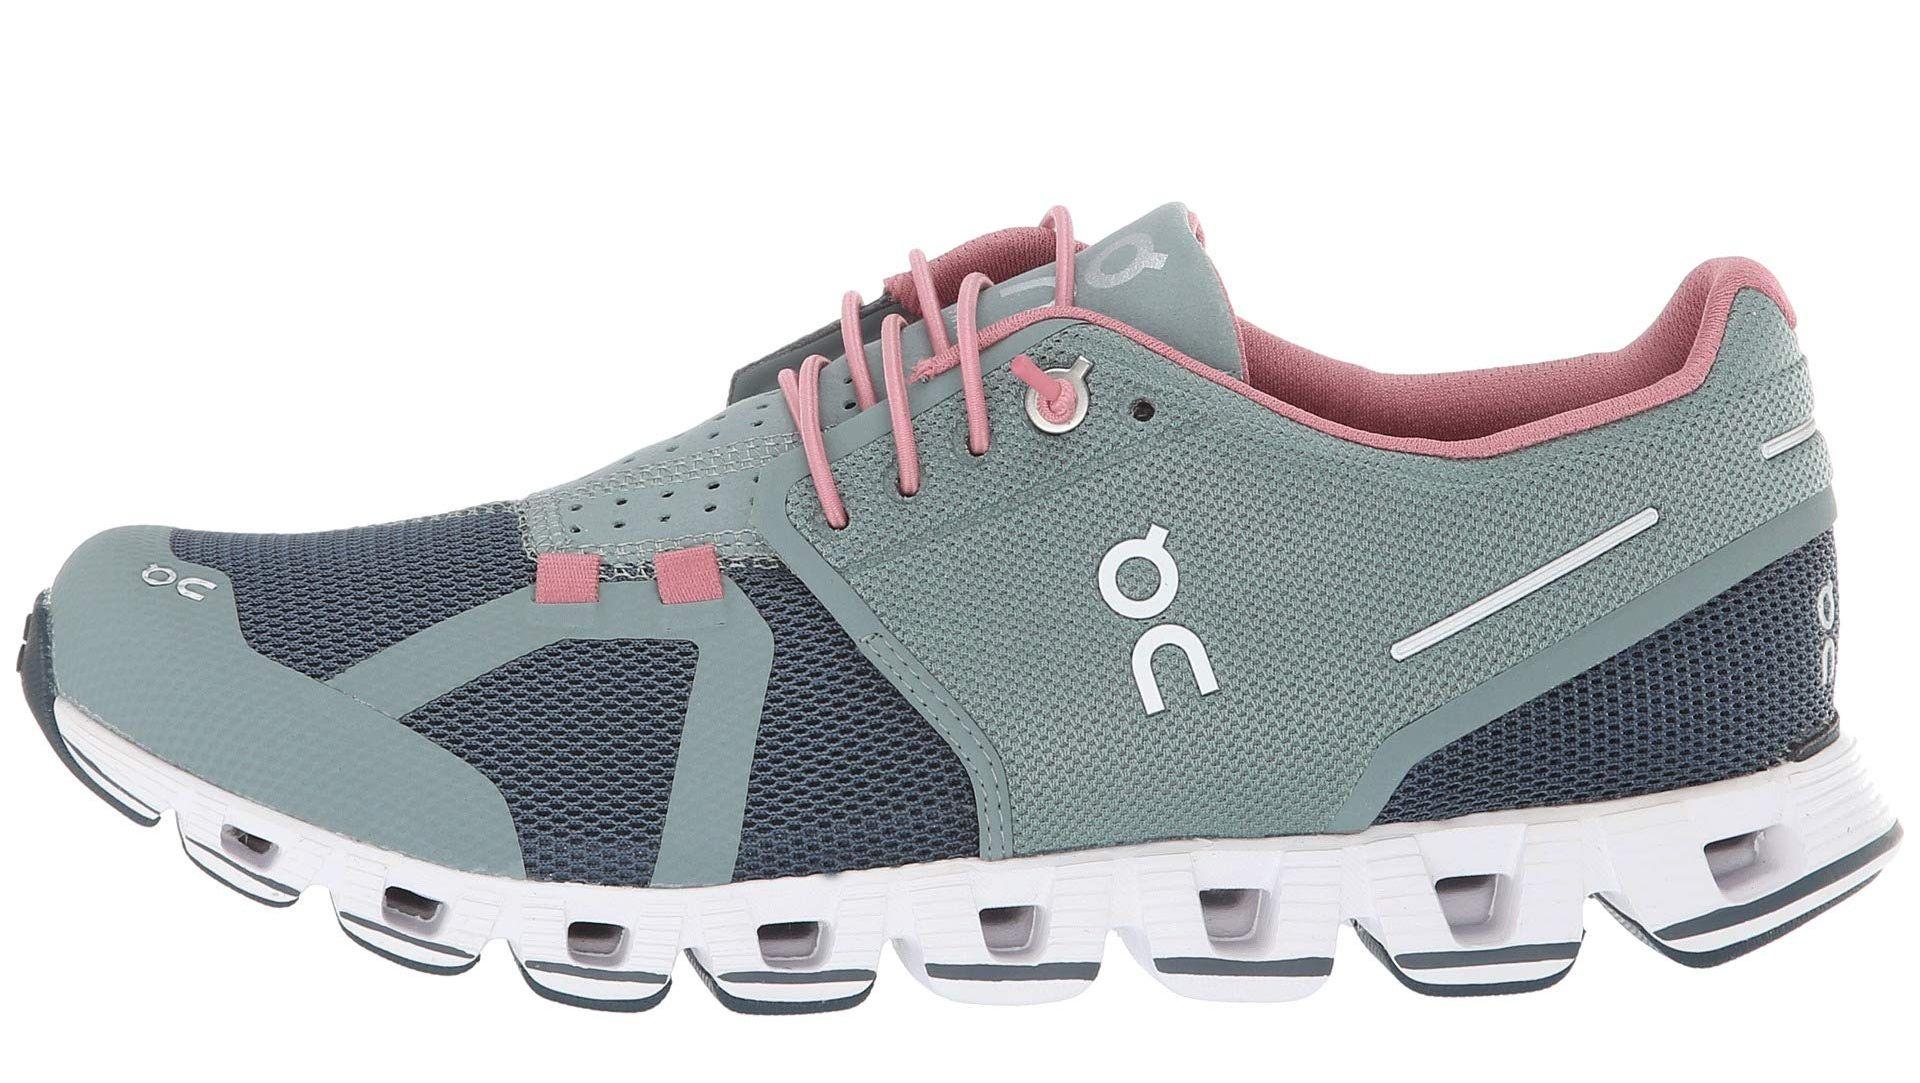 de2a41002ff4 Cloud 2.0. Buy Men s Buy Women s The right shoe ...